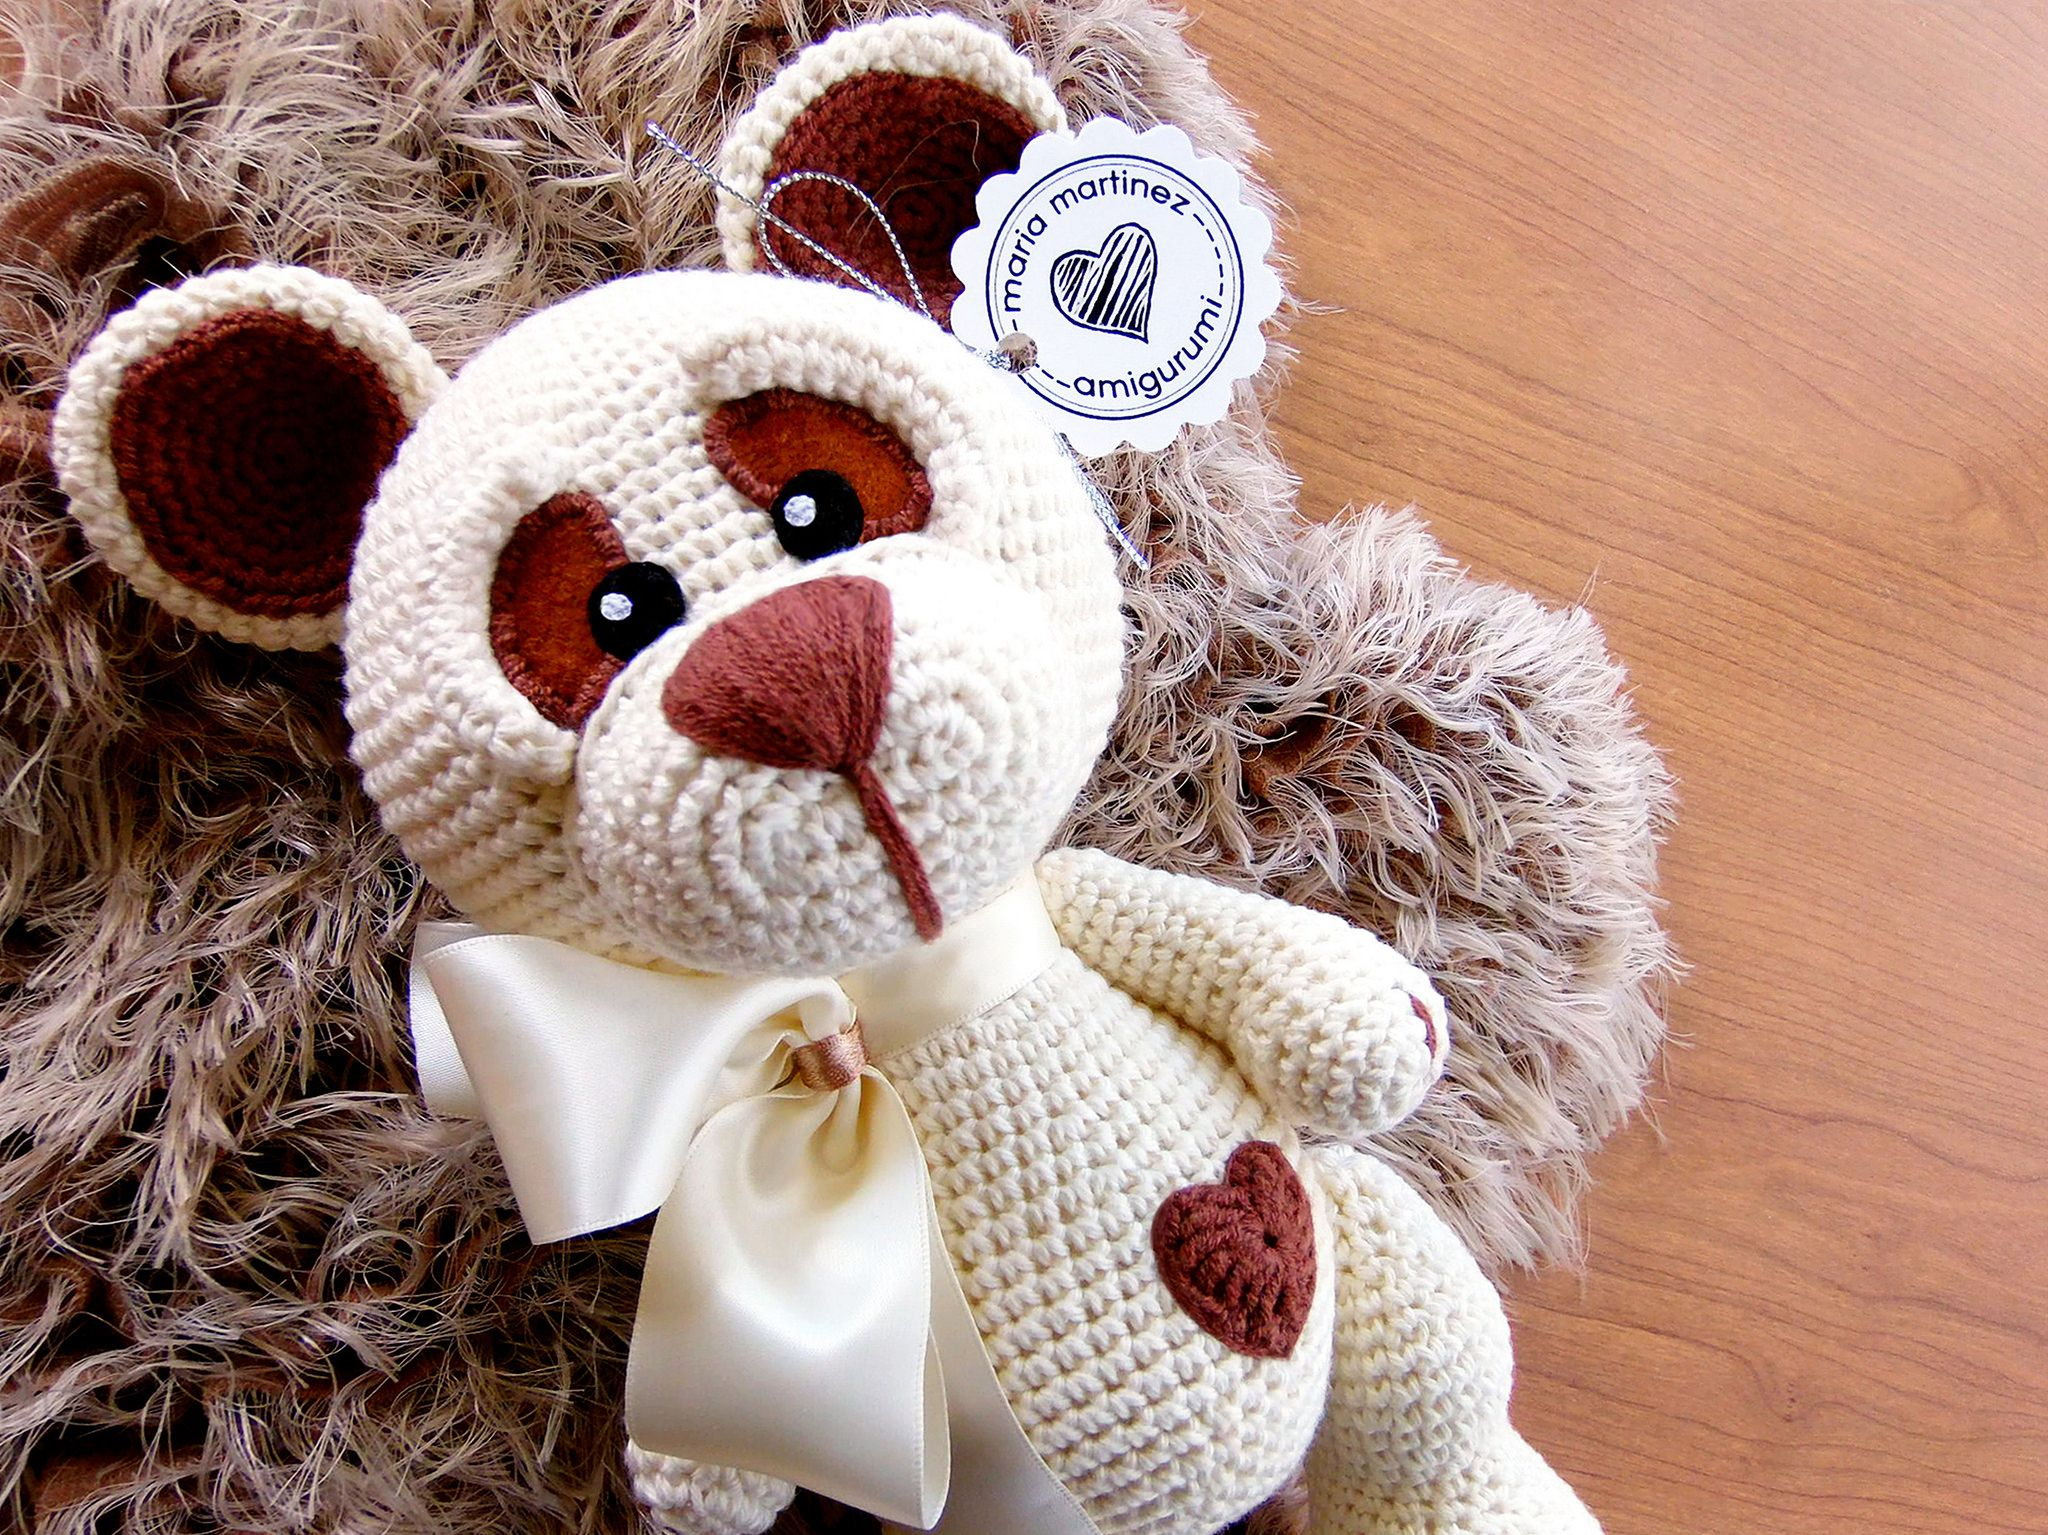 Amigurumi Crochet Patterns Teddy Bears : Maria martinez amigurumi teddy bear amigurumi teddy bear and